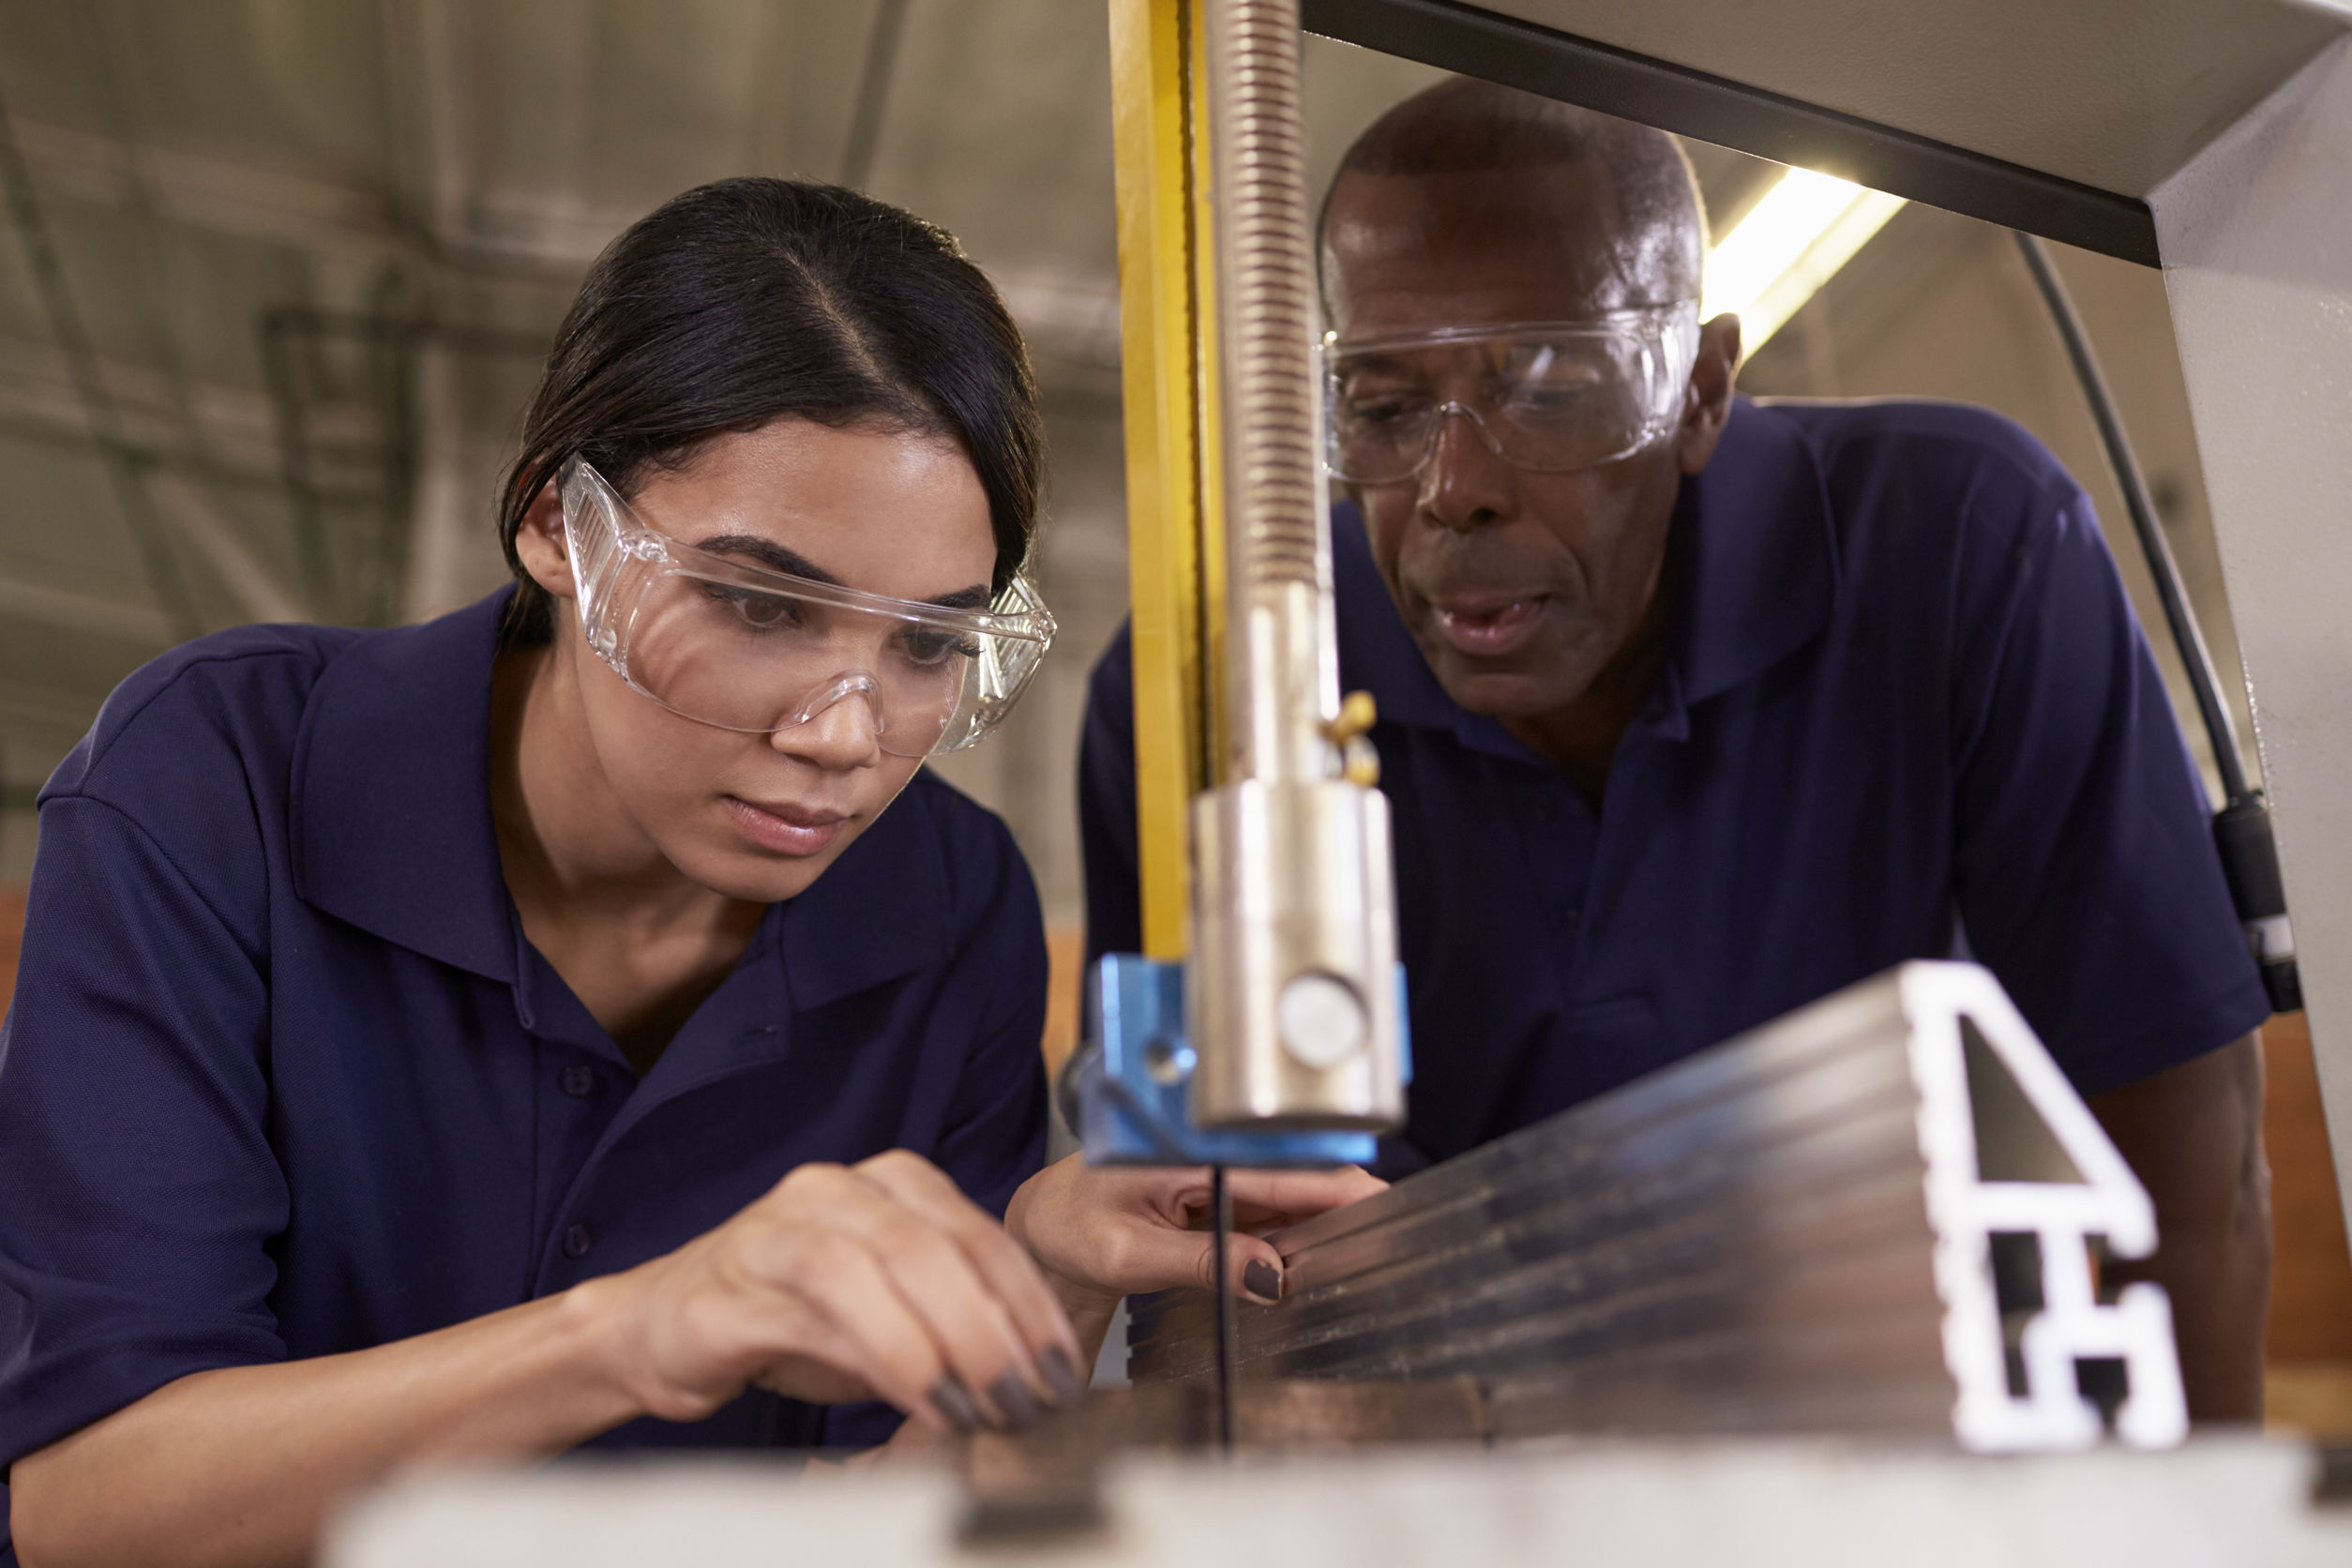 Machinists Union to Launch National Apprenticeship Strategic Initiative